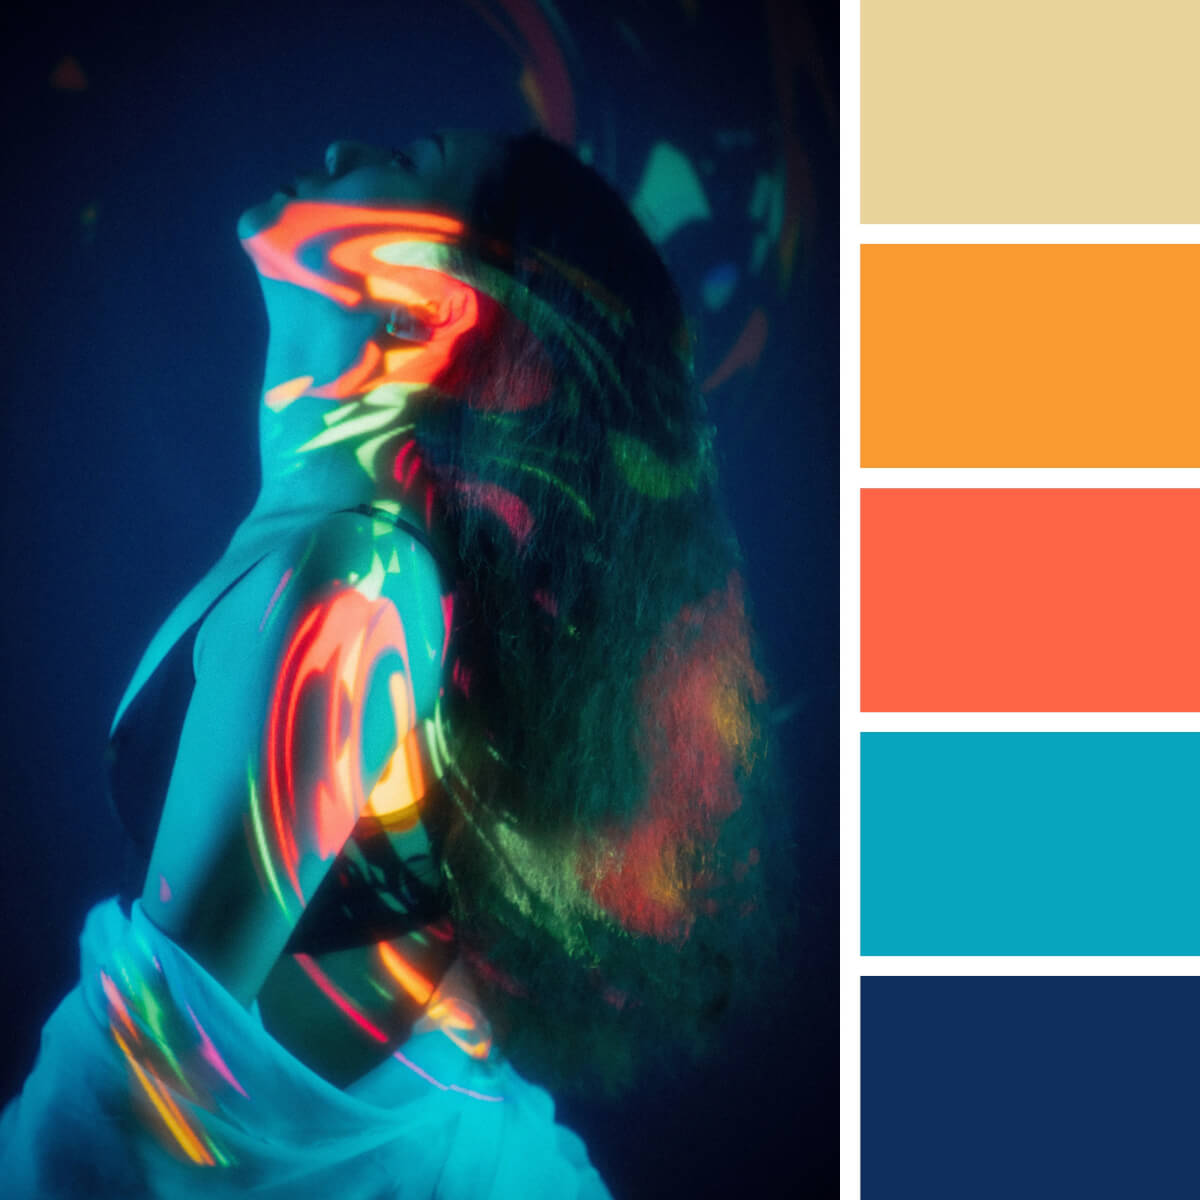 Electric Blue & Orange